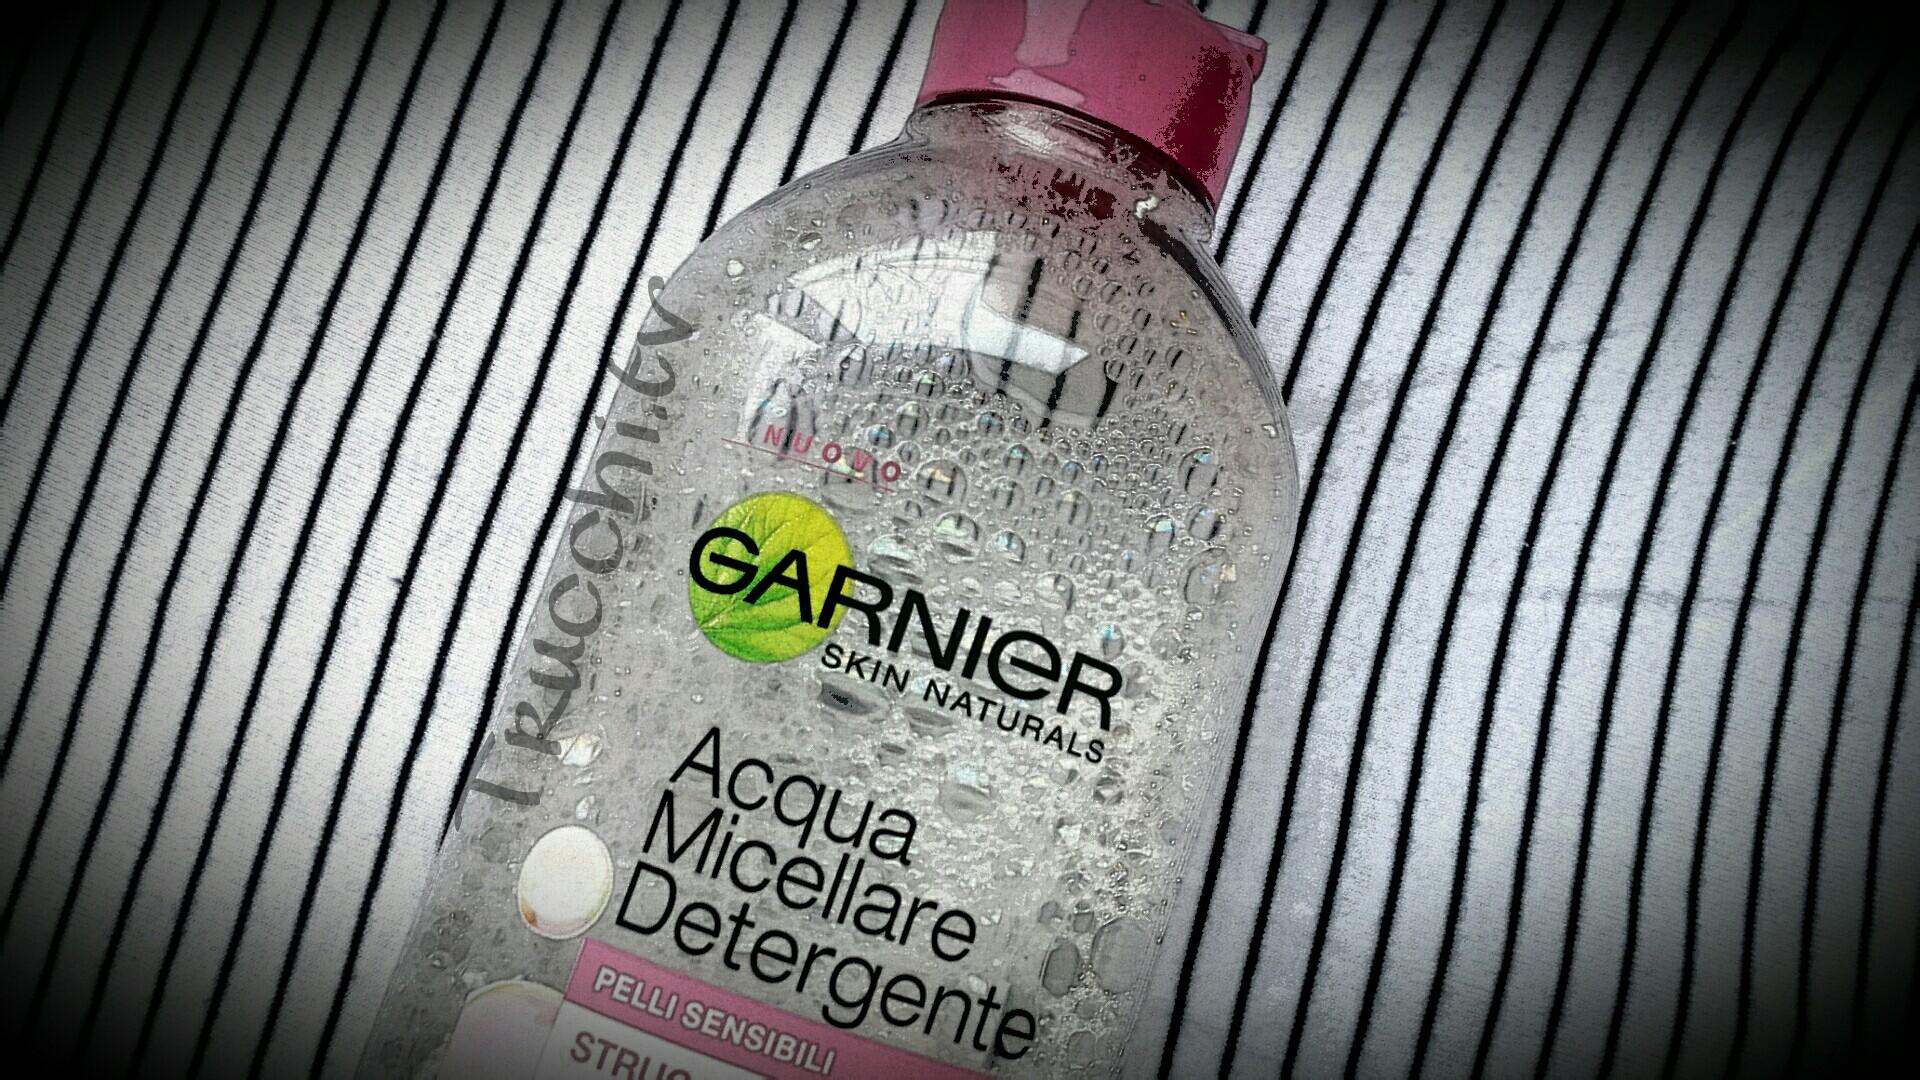 Acqua micellare detergente garnier